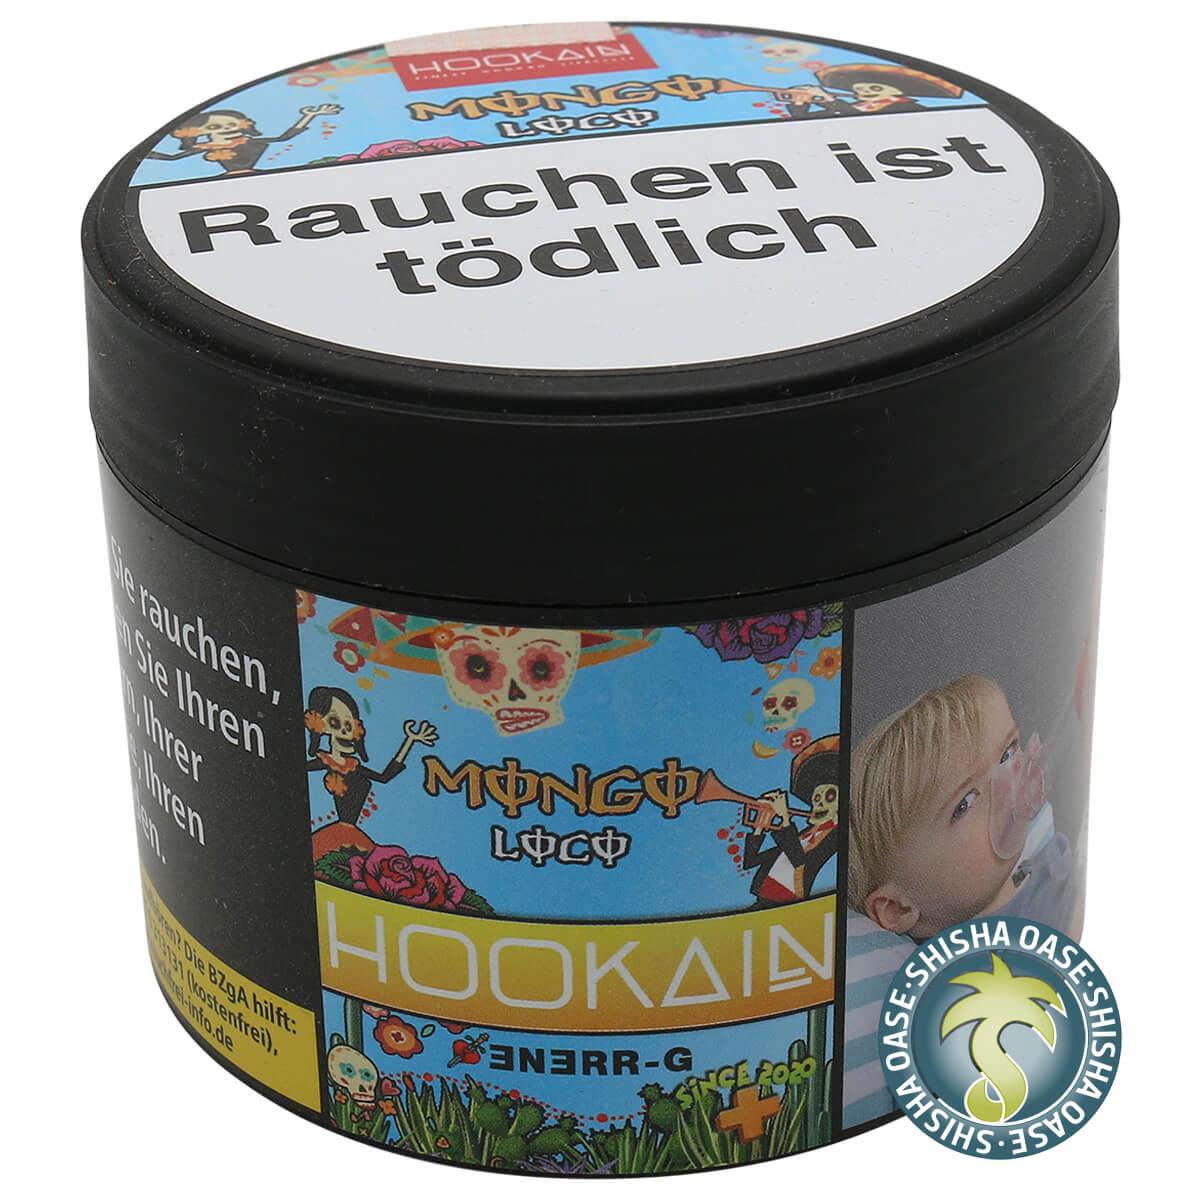 Hookain Tabak Mongo Loco RR 200g